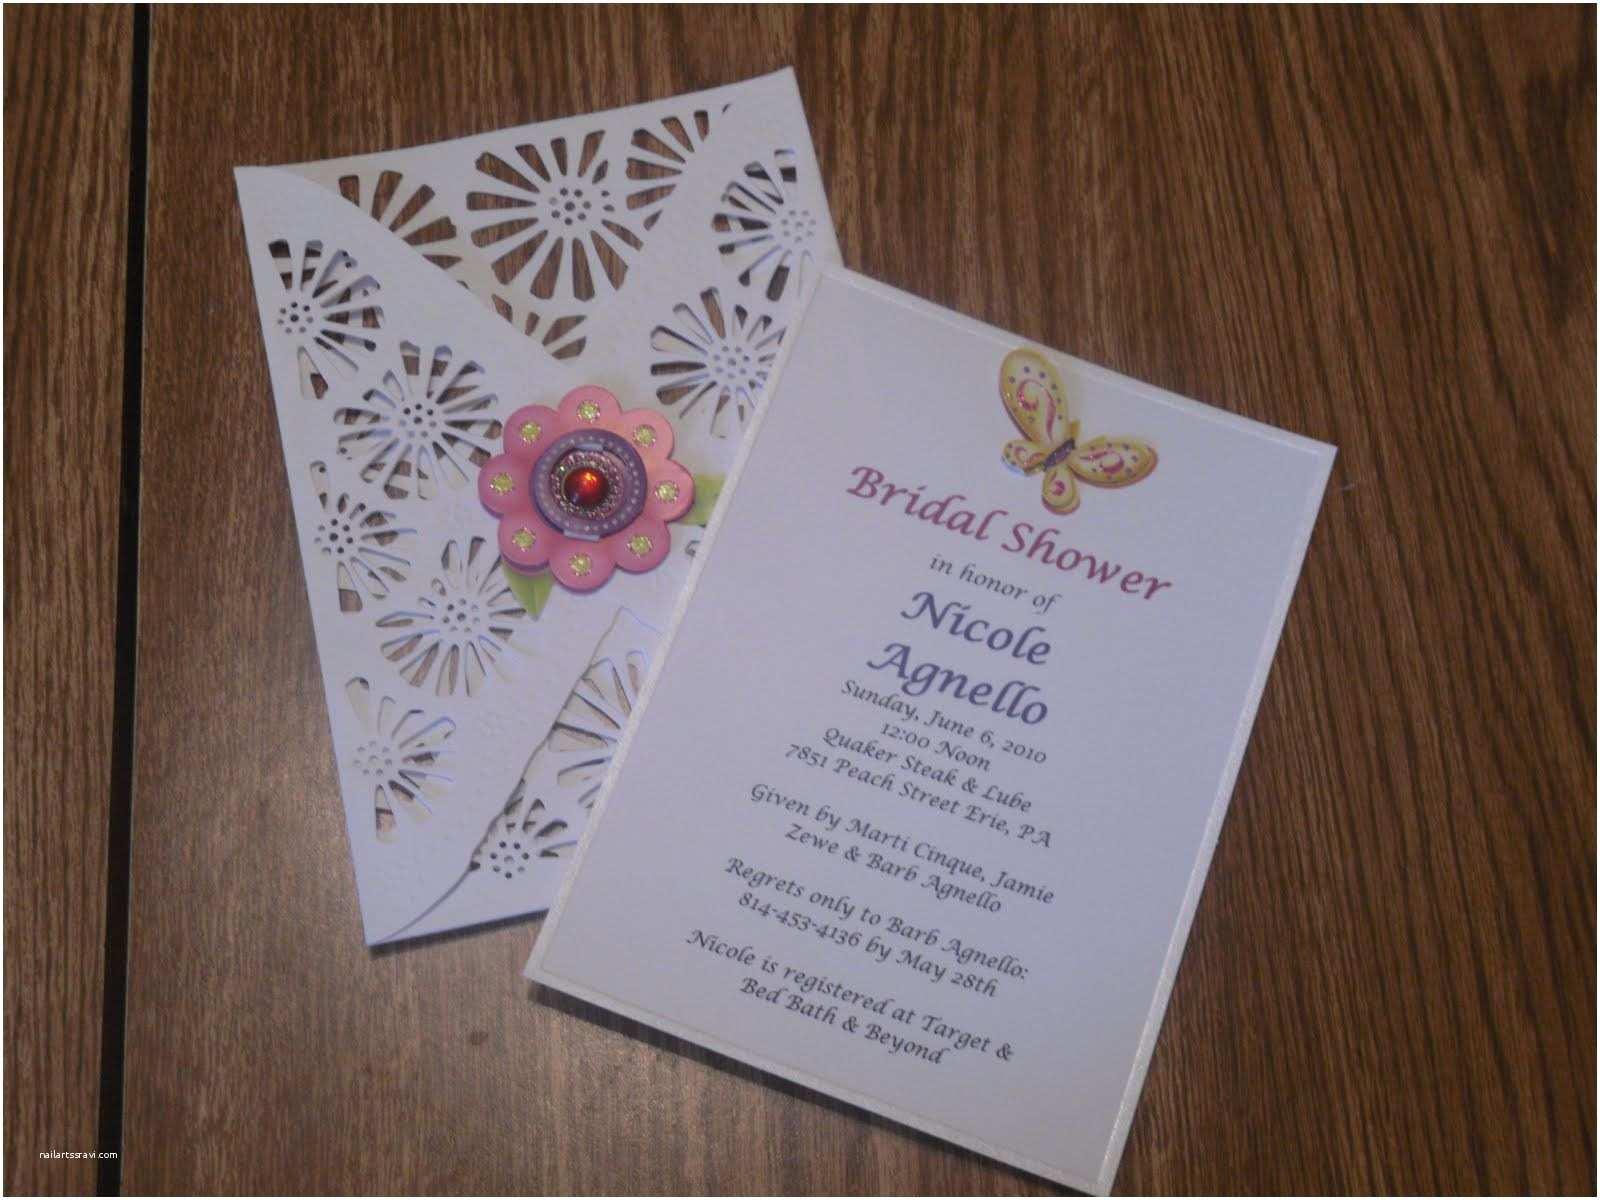 Cheap Bridal Shower Invitations Inexpensive Bridal Shower Invitations Cheap Bridal